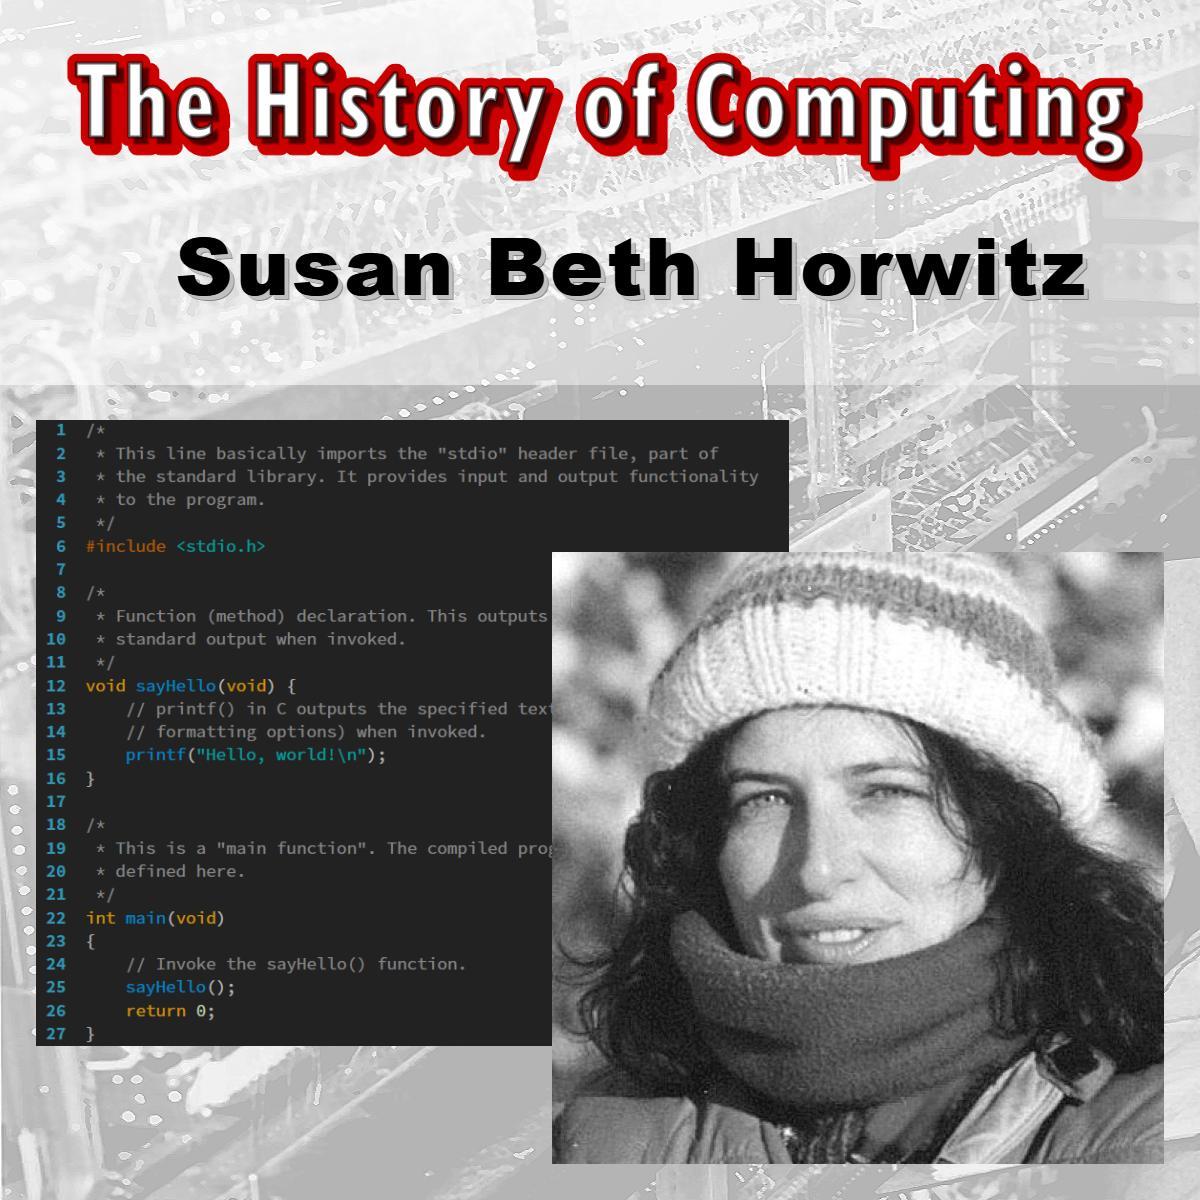 Susan Beth Horwitz